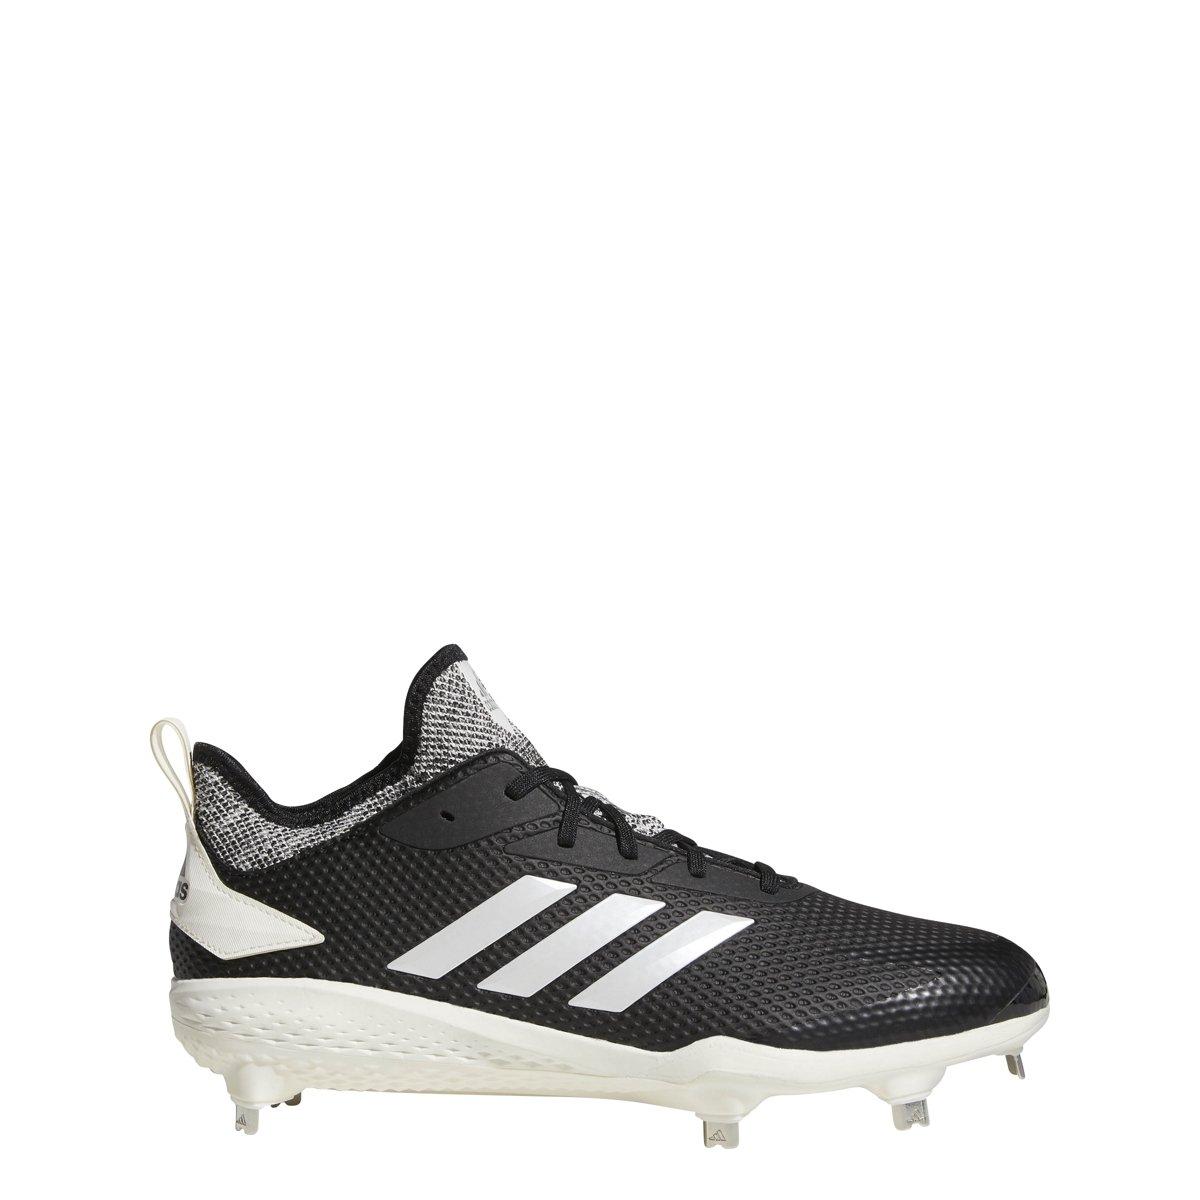 adidas Men's Adizero Afterburner V, Black/Cloud White/Grey, 8.5 M US